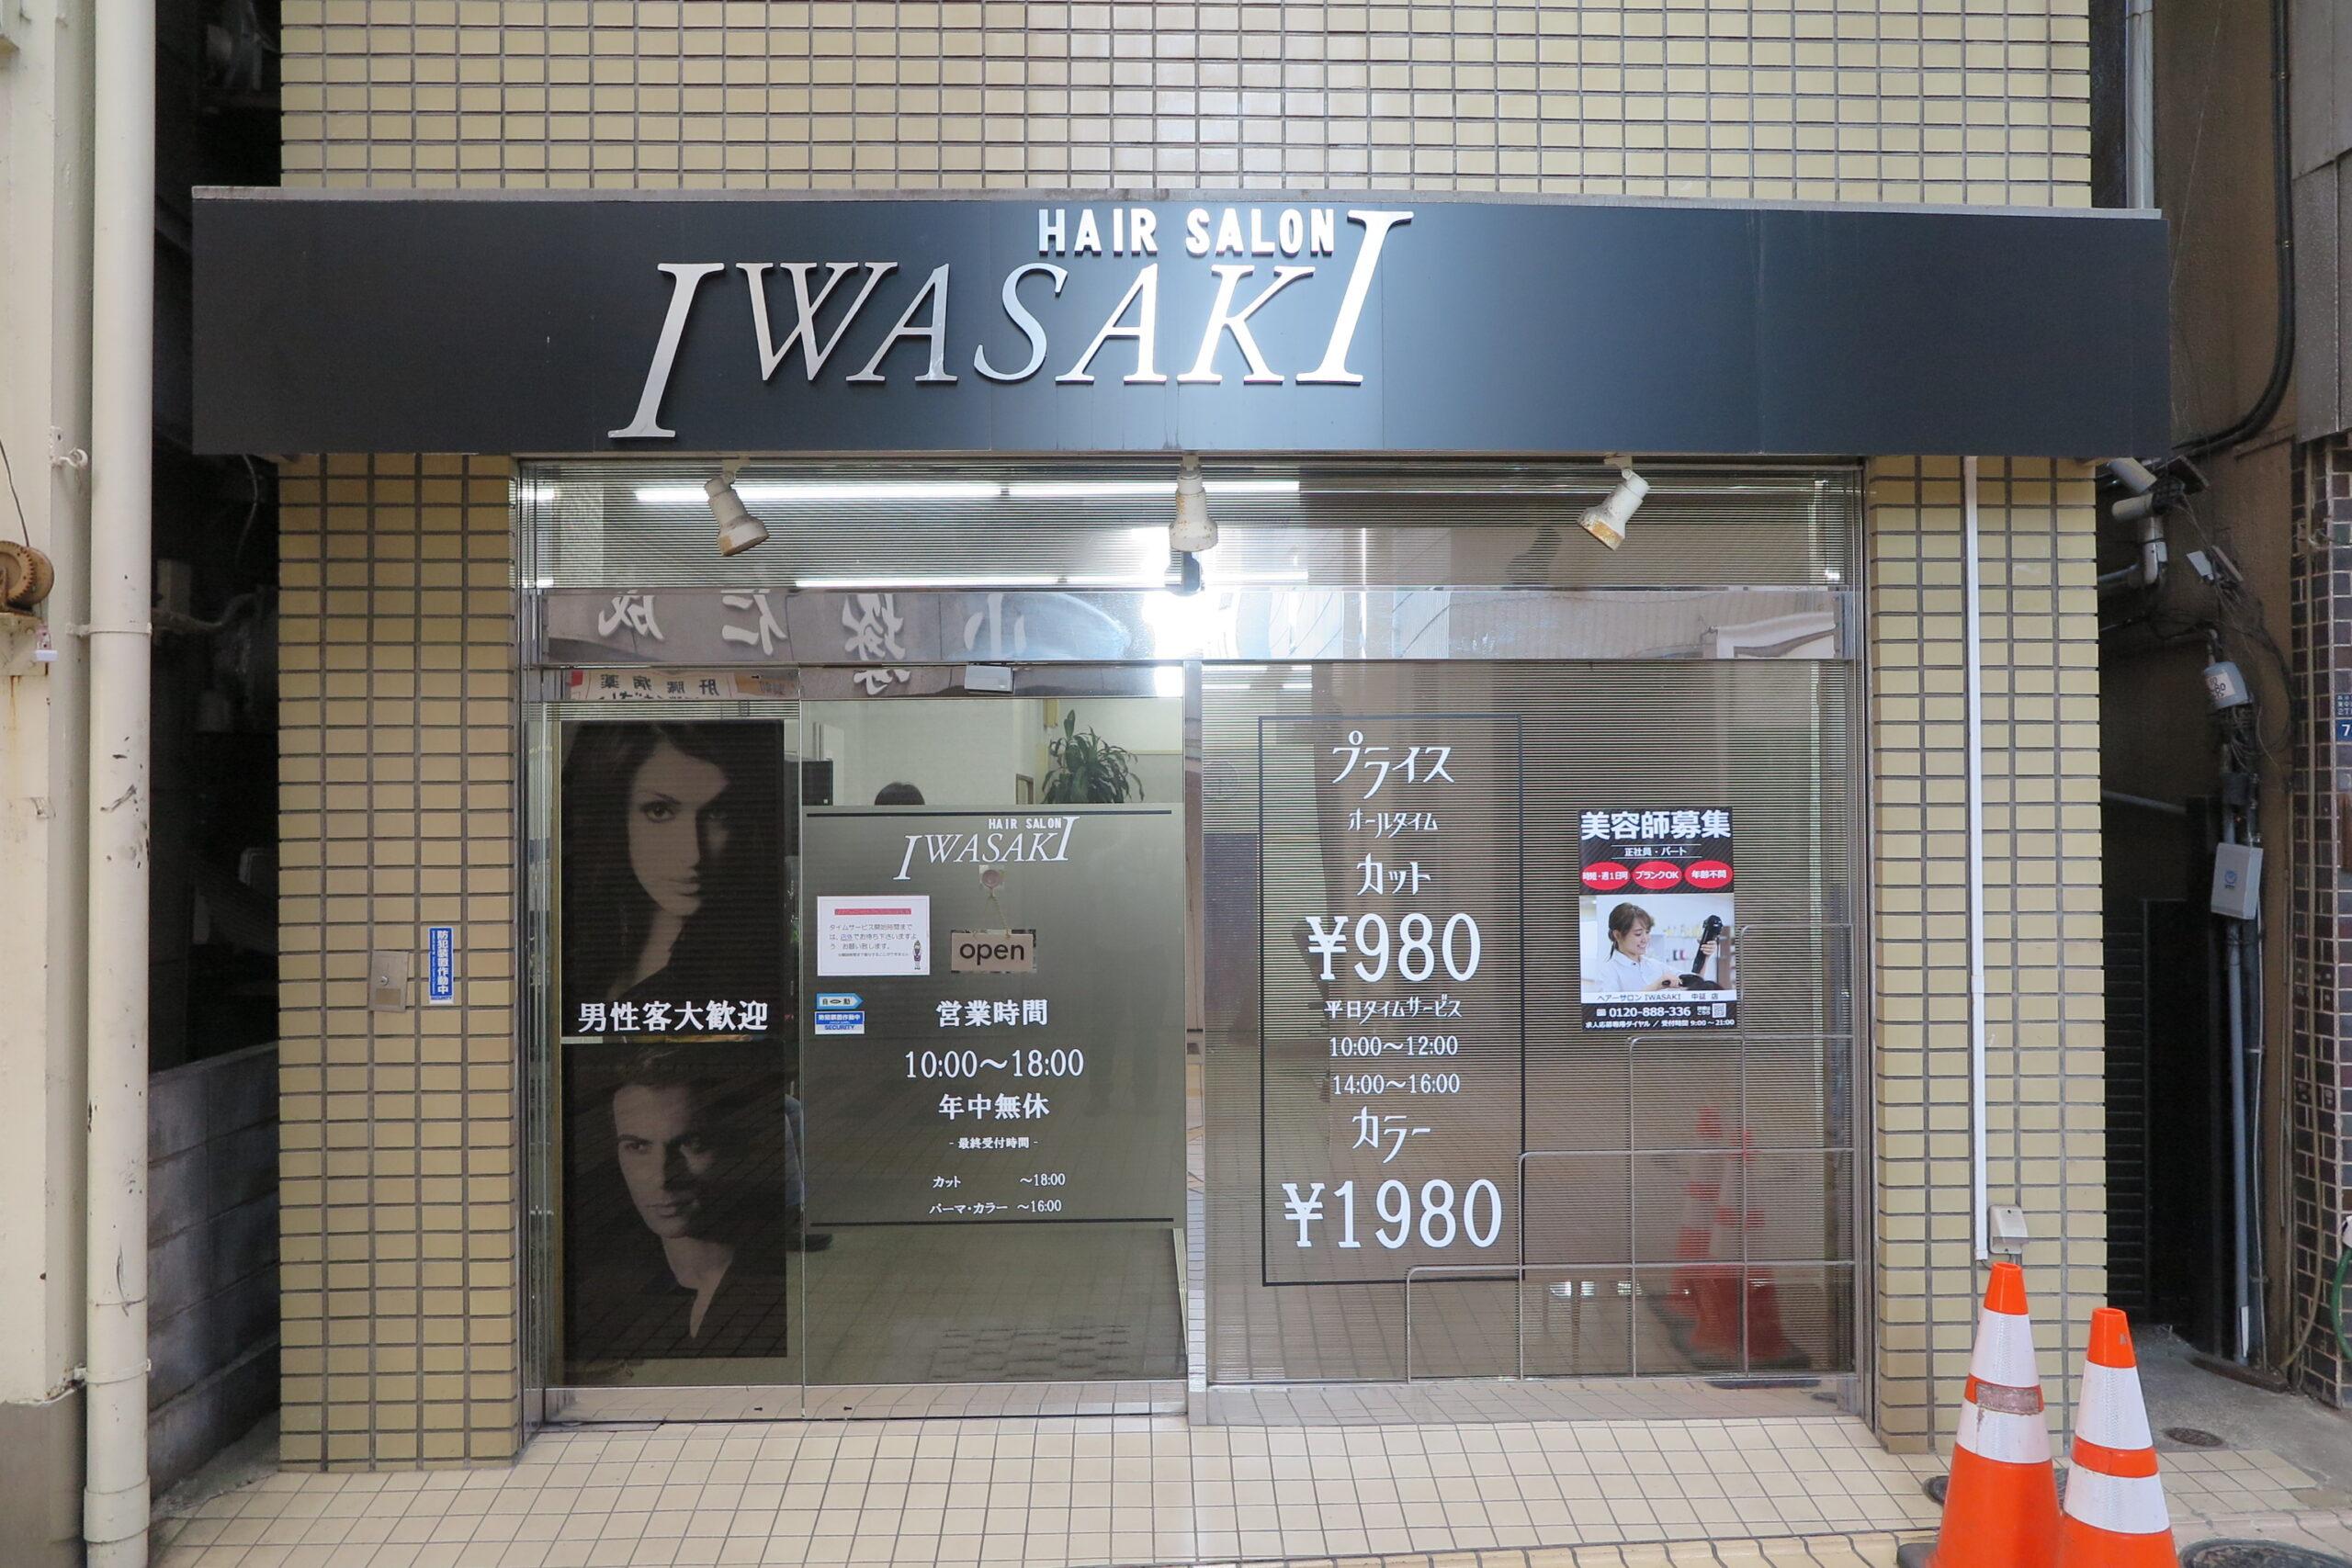 https://nakanobu.com/wp-content/uploads/2021/04/c24f23ccf5411c33ca5cb7e69b5a1137-scaled.jpg